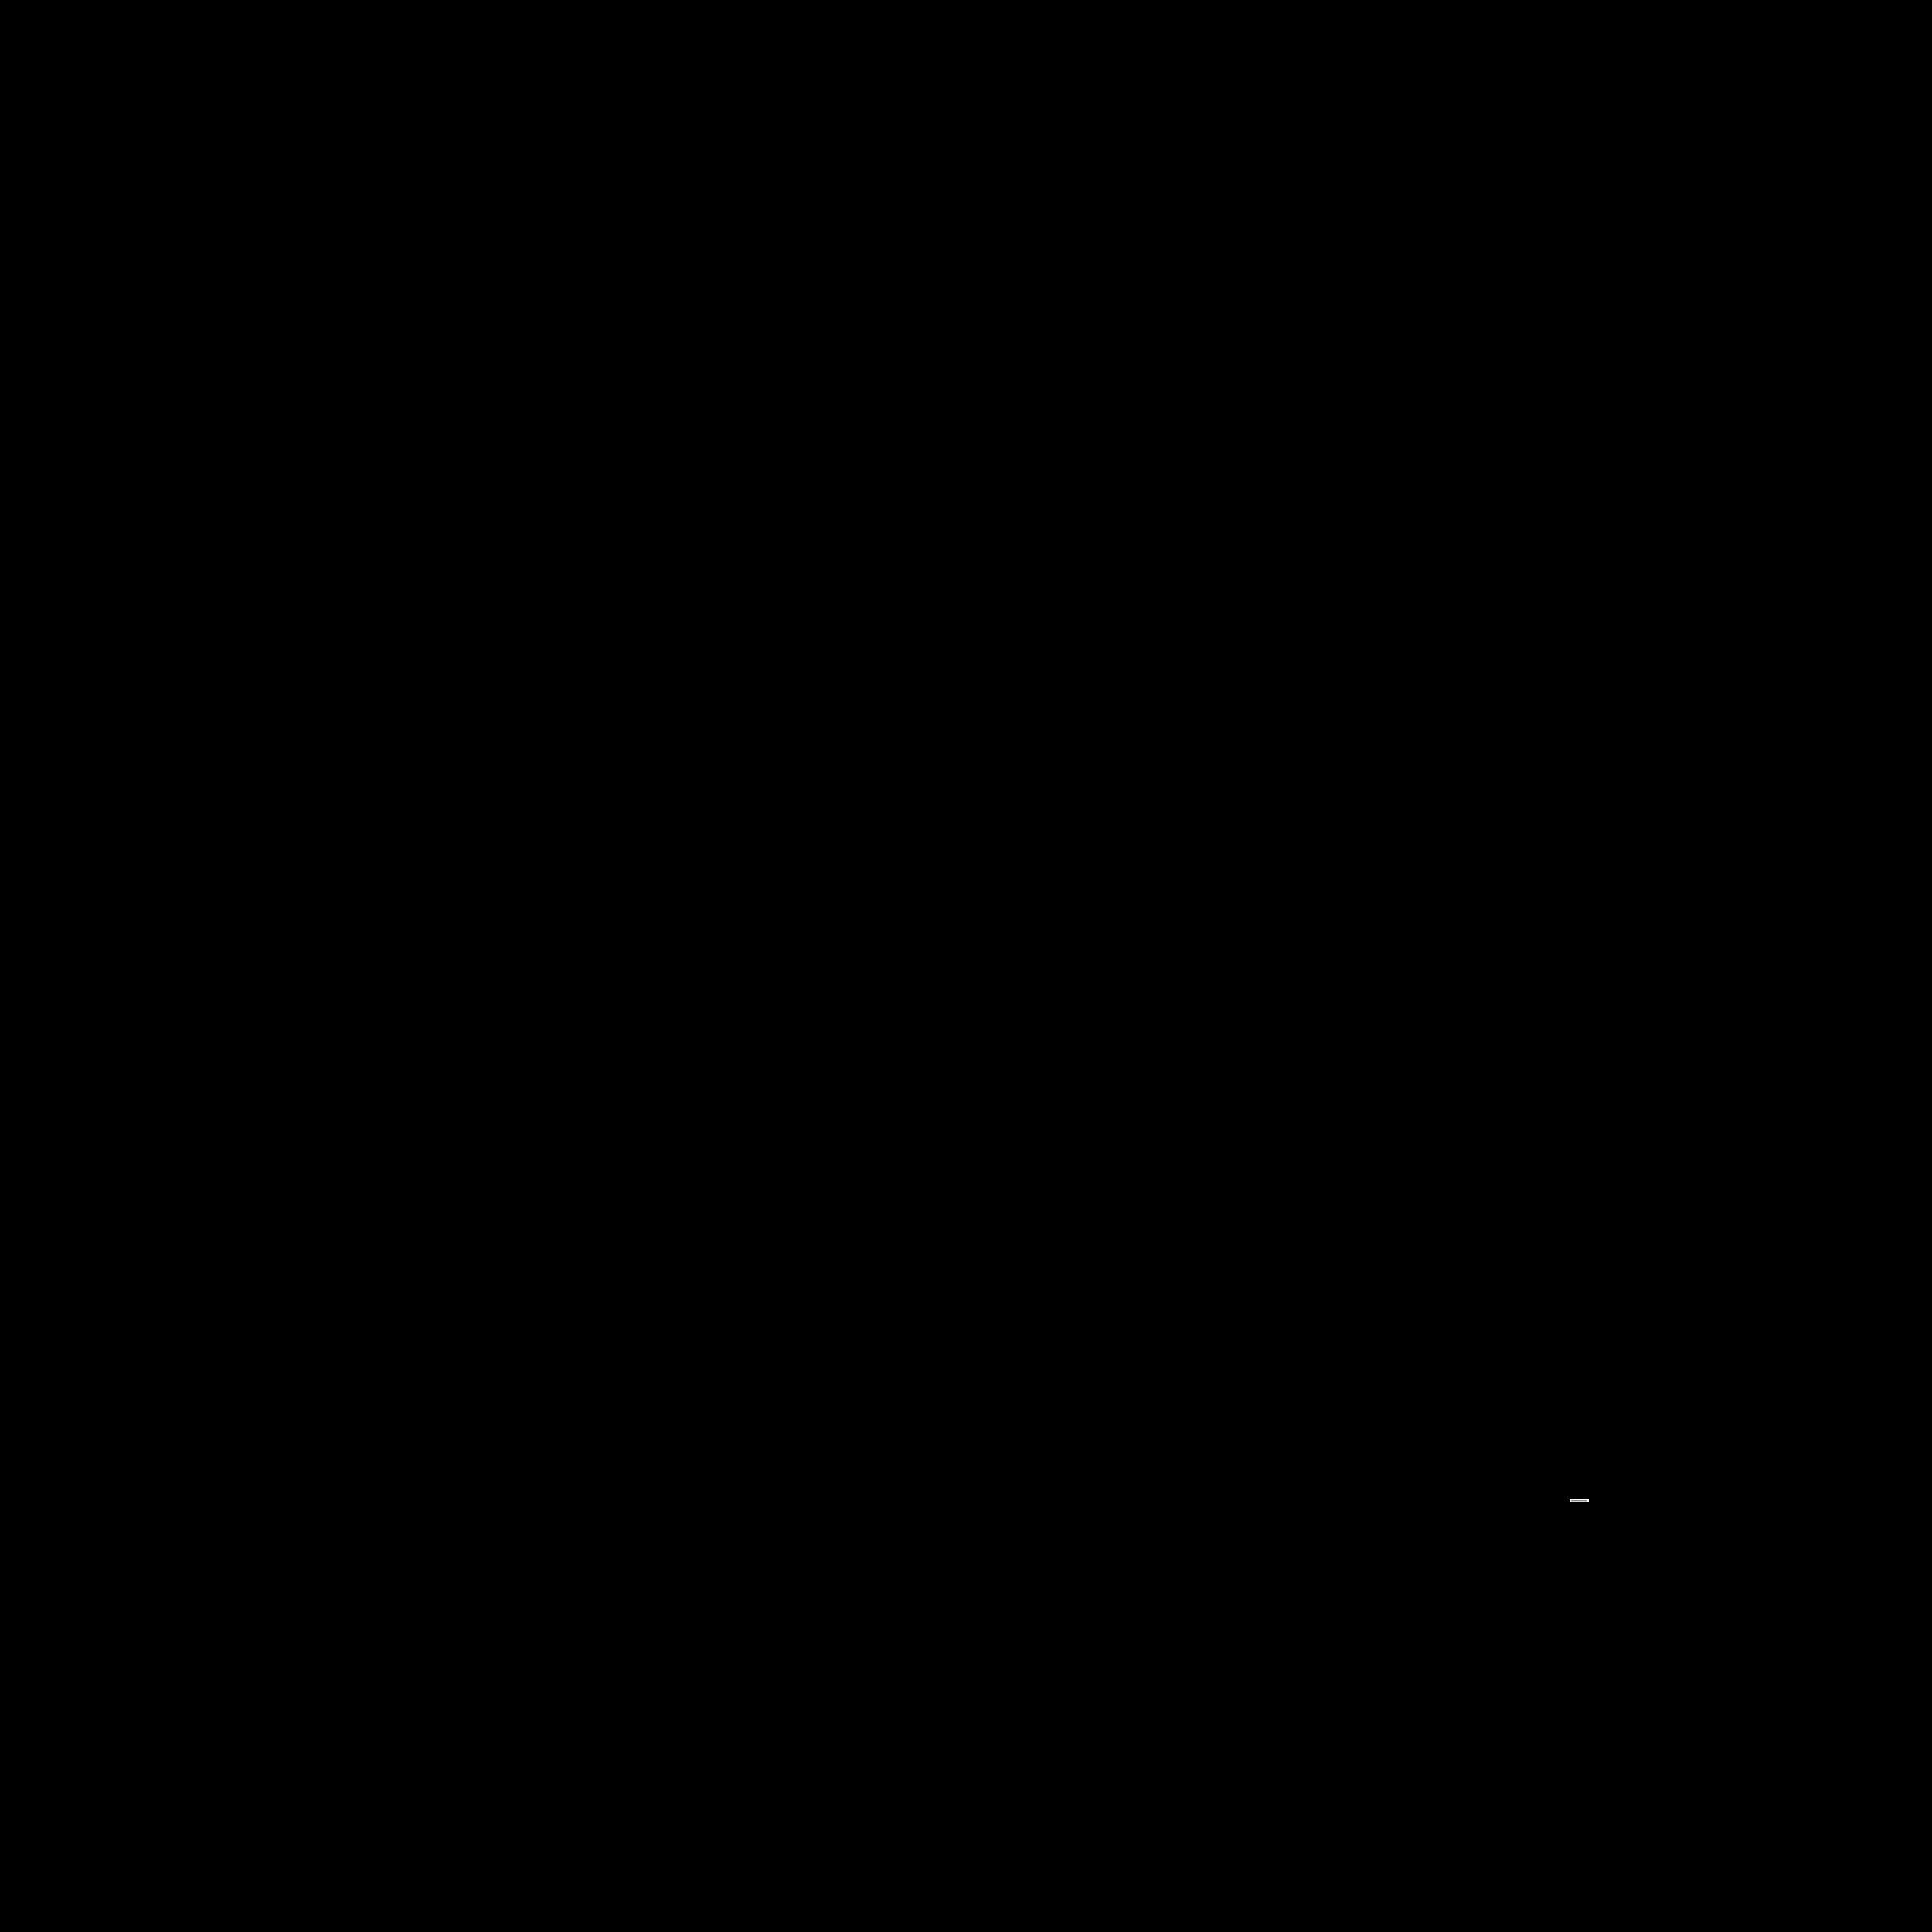 Panda Joy Orthographic-03.png